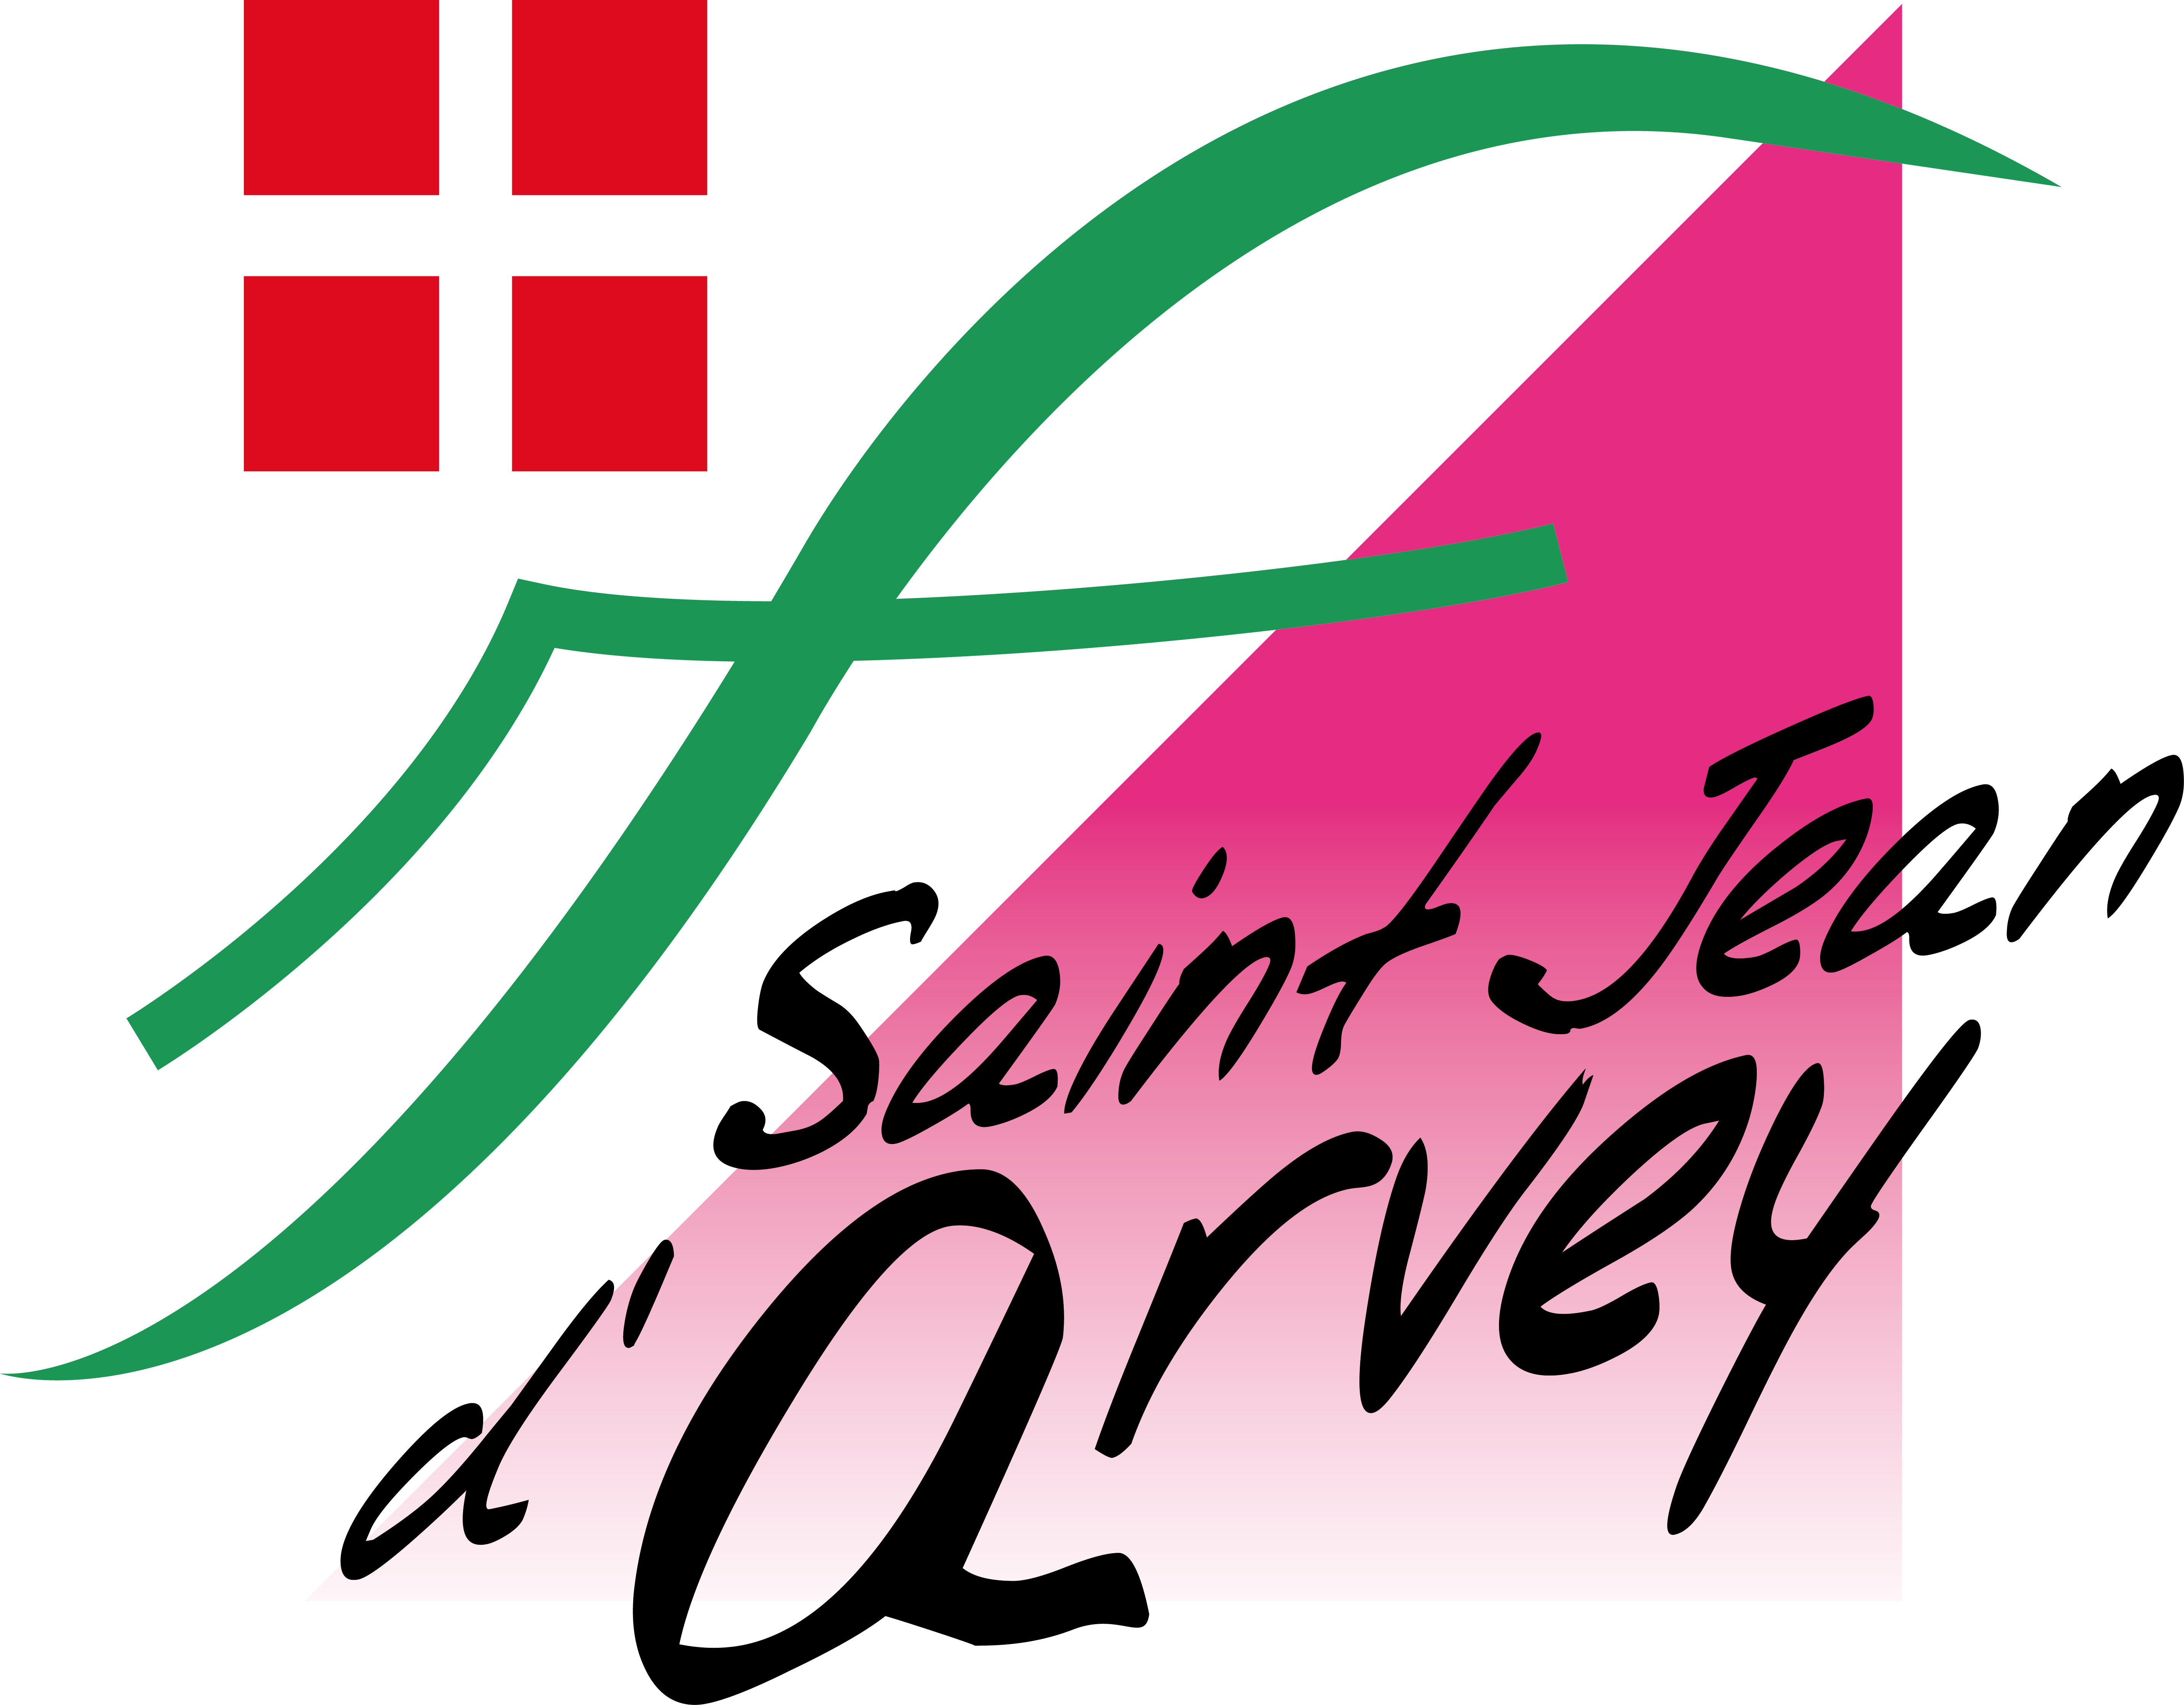 Saint-Jean-d'Arvey